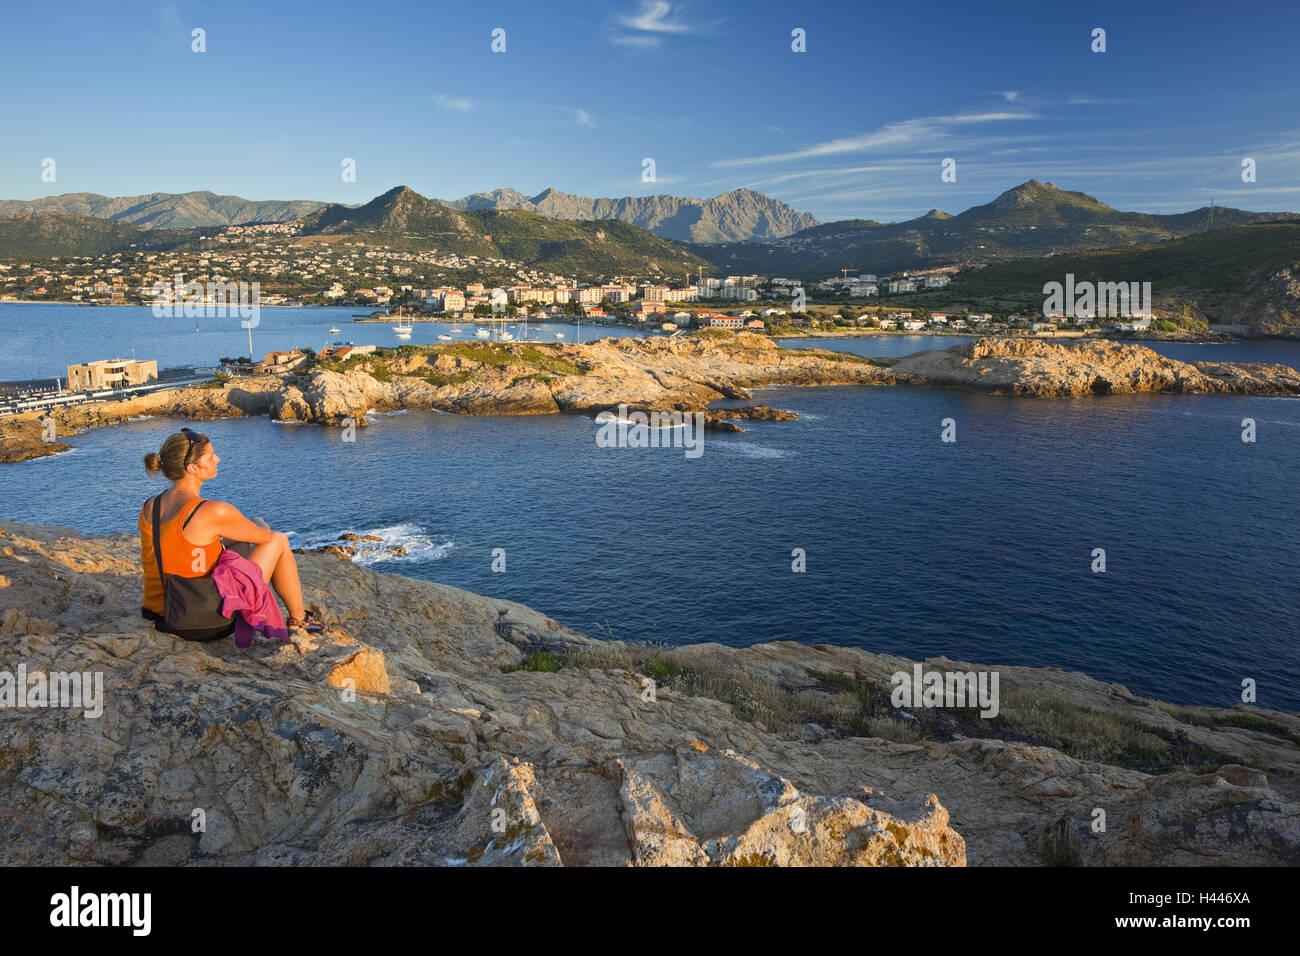 Francia, Córcega, L'Ile Rousse, rock coast, mujer, relajación, vista posterior, Imagen De Stock